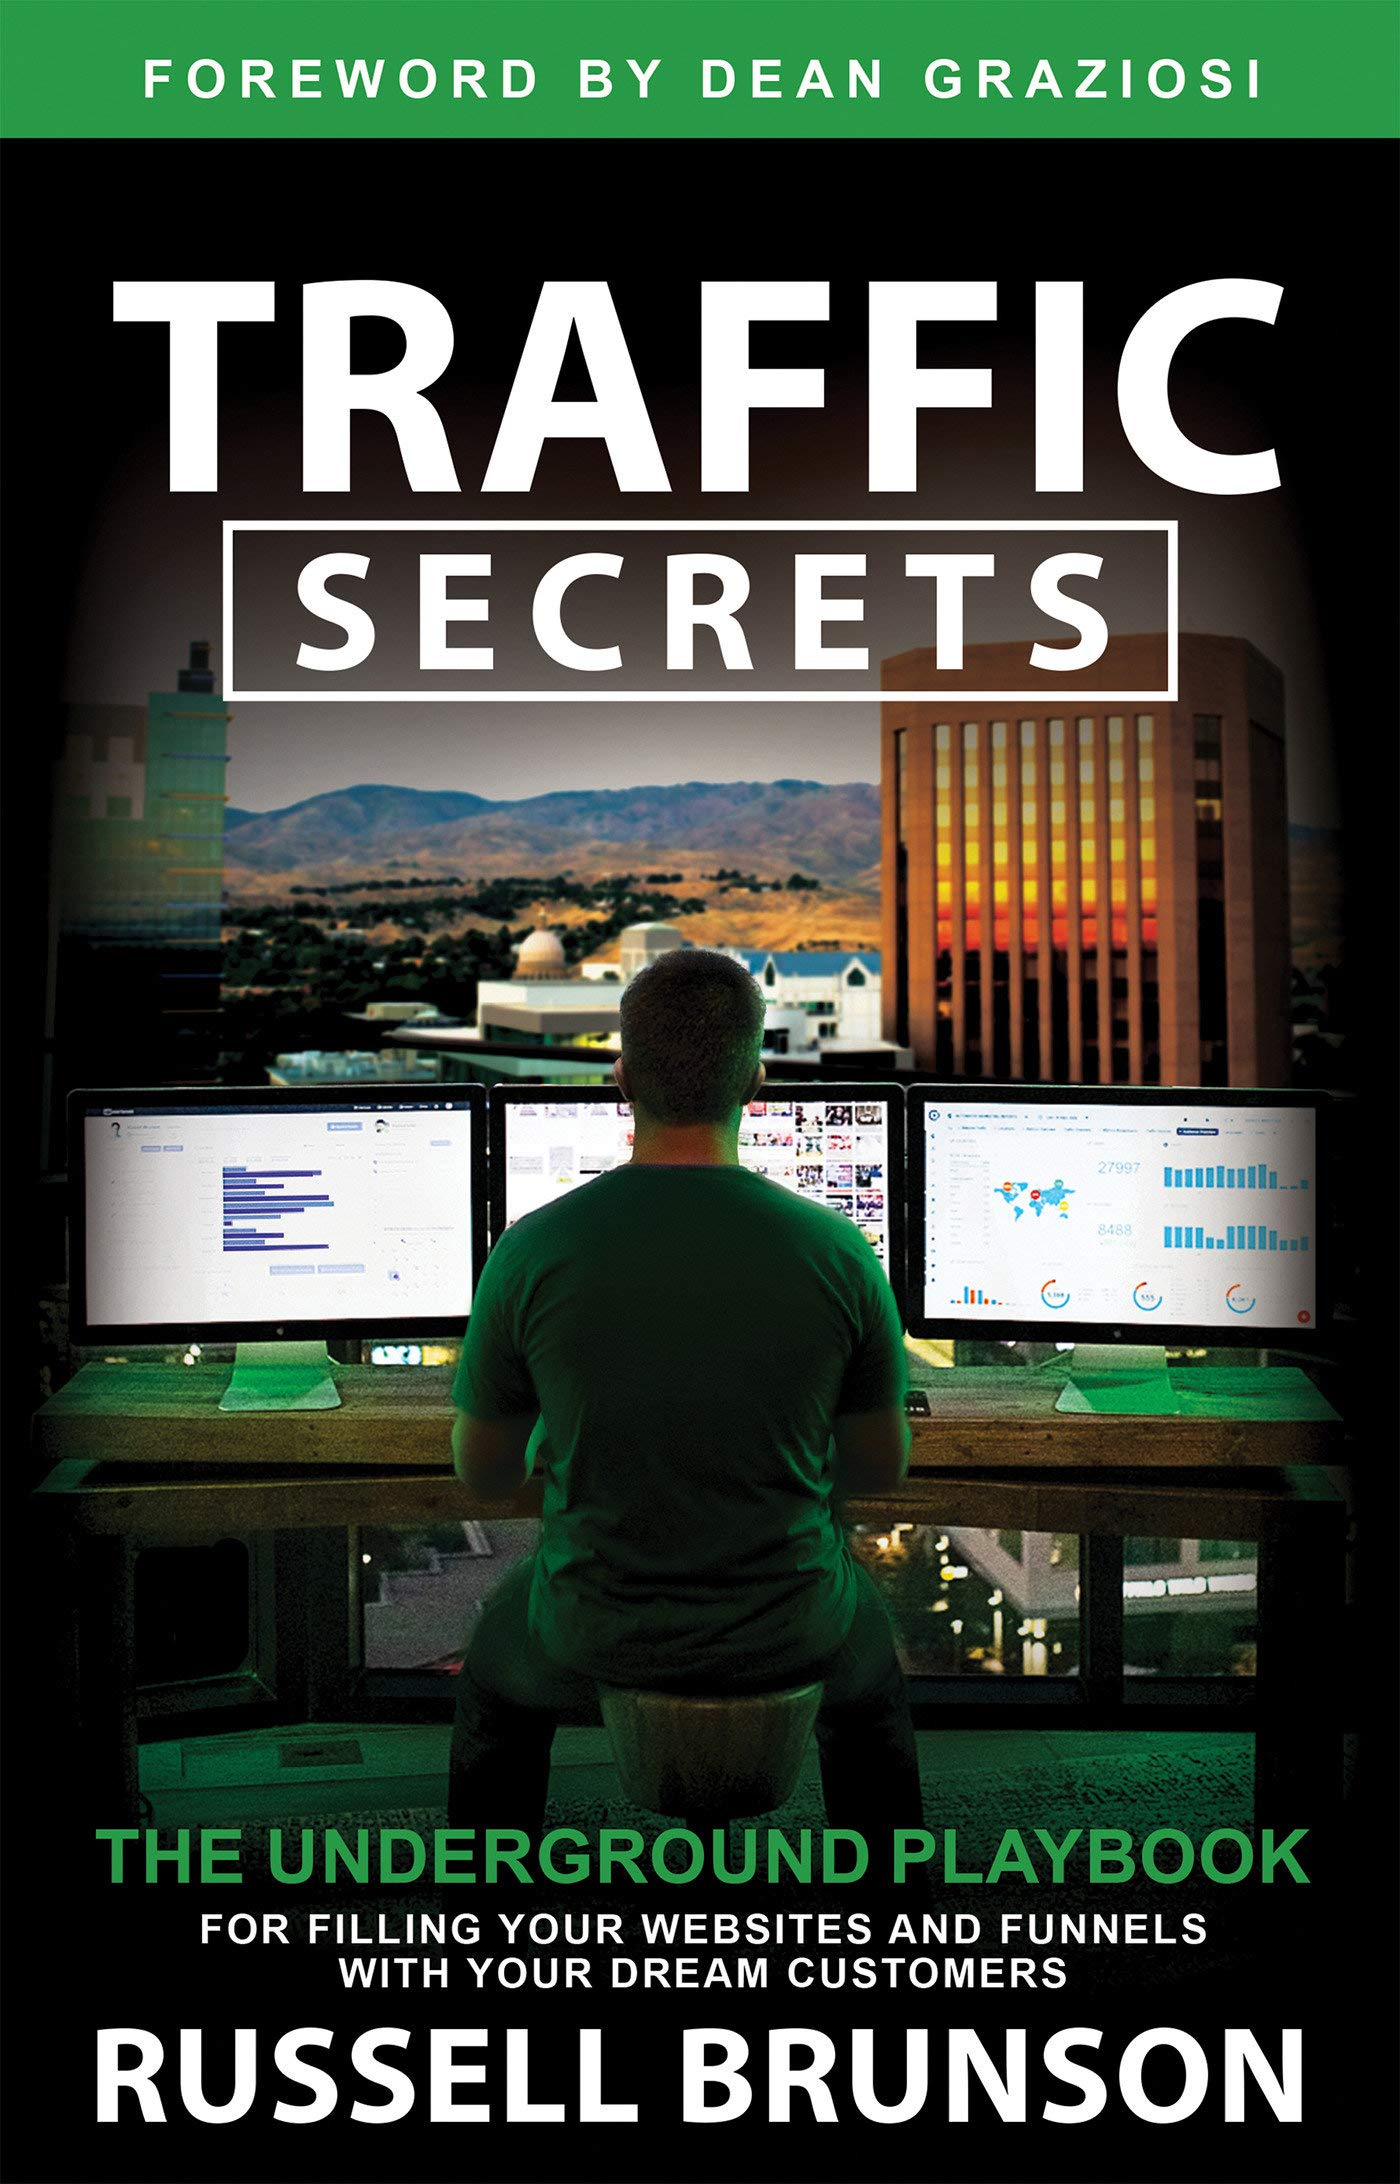 Acheter le livre Traffic Secrets par Russell Brunson